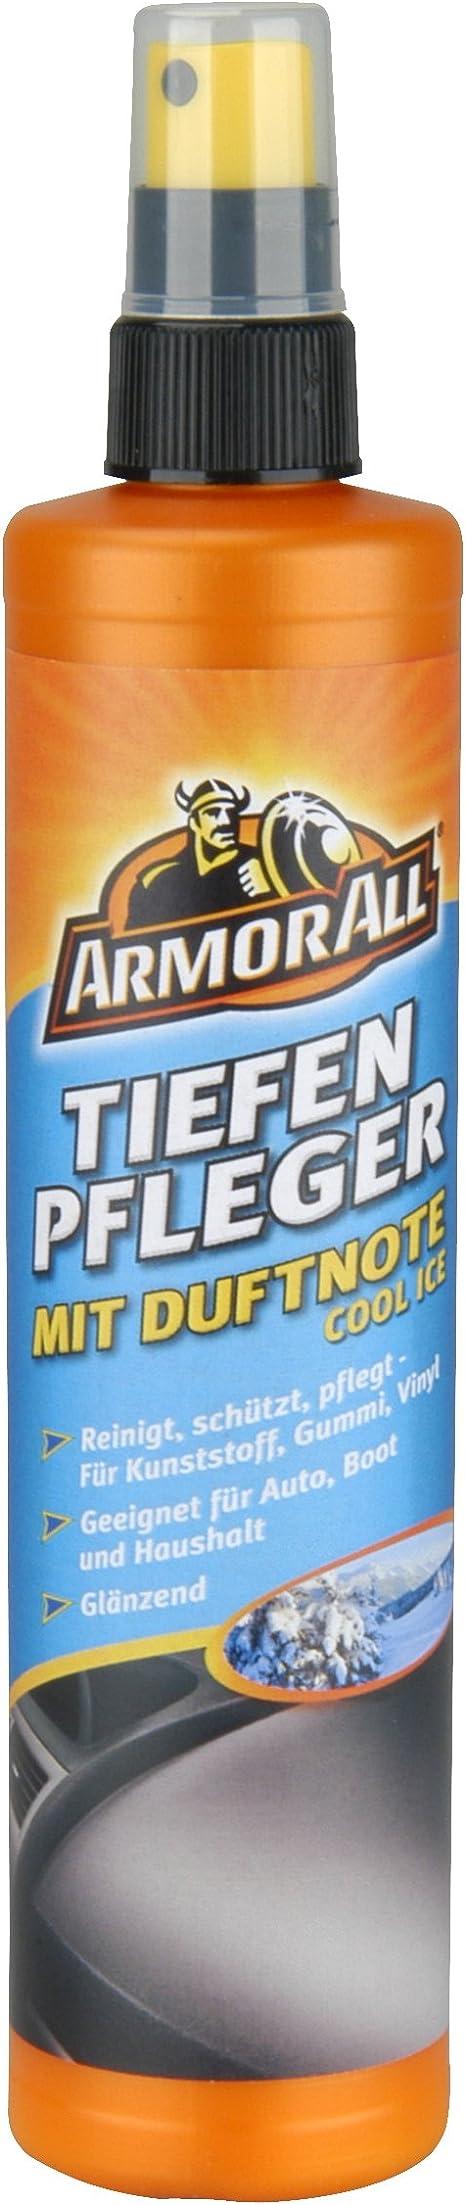 Armor All Kunststoff Tiefenpfleger Glänzend 1 000 Ml Für Vinyl Gummi Behandeltes Leder Versiegeltes Holz U V M Auto